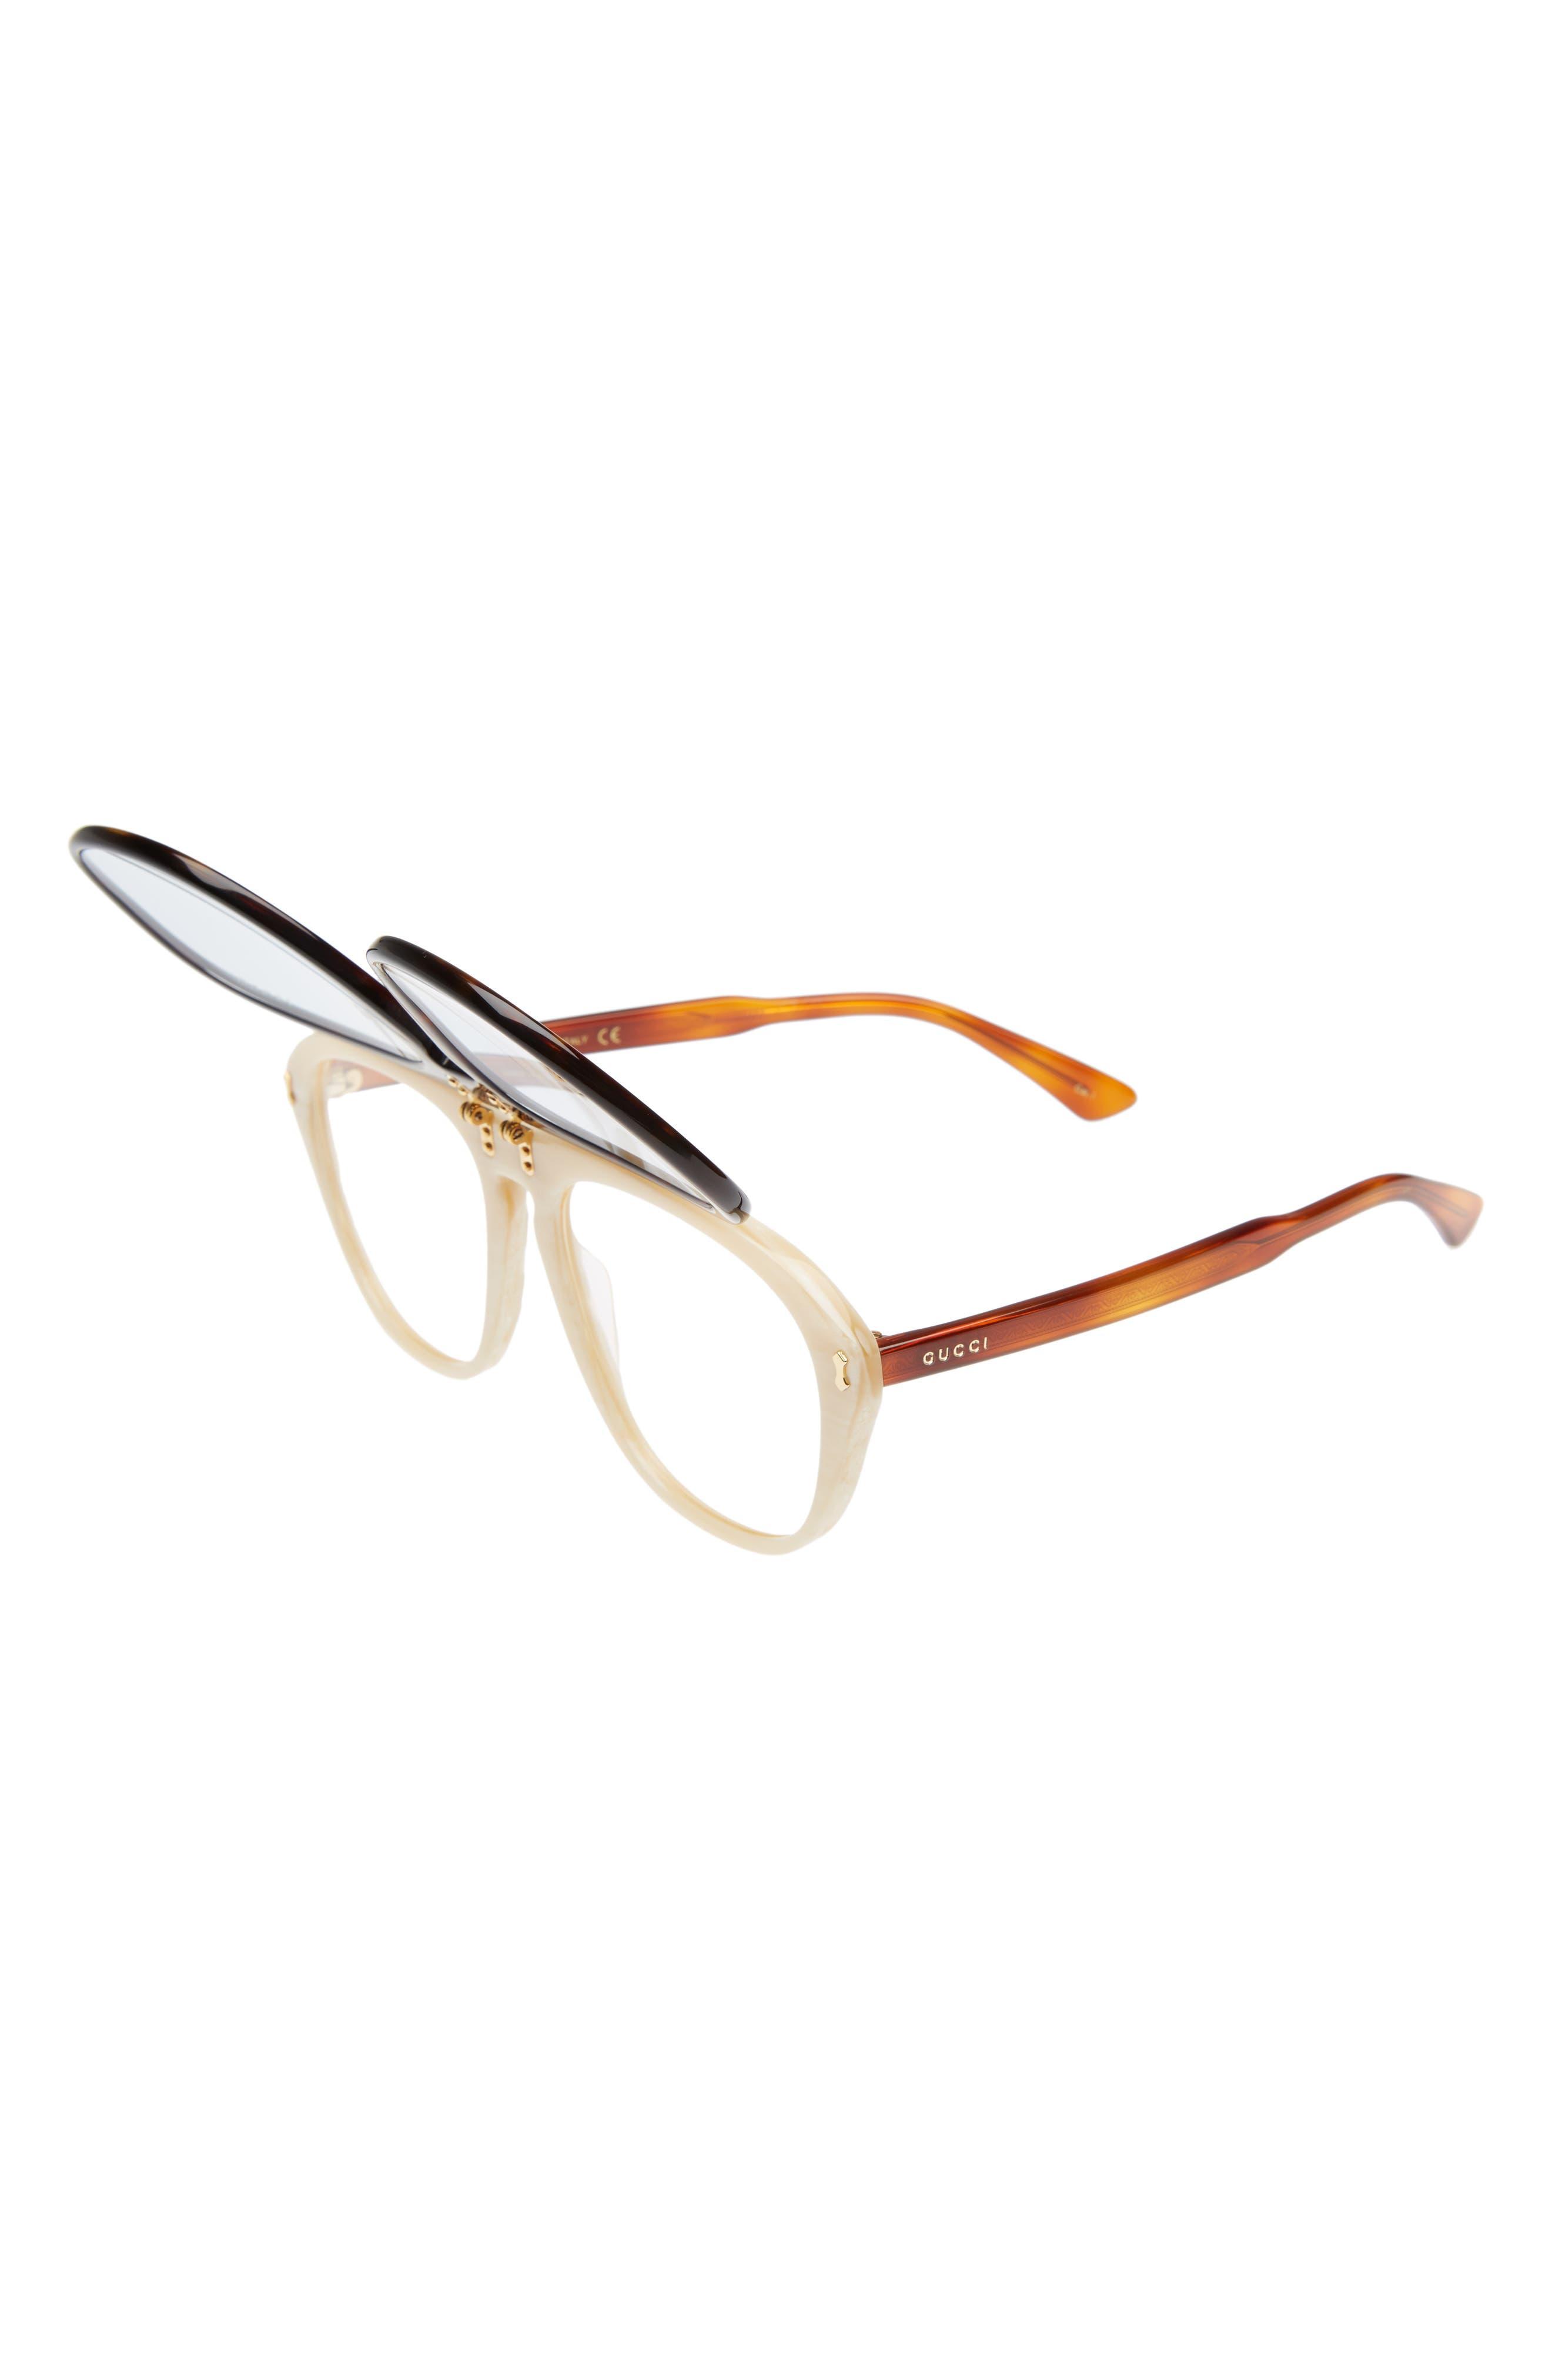 56mm Flip-Up Sunglasses,                             Alternate thumbnail 3, color,                             200